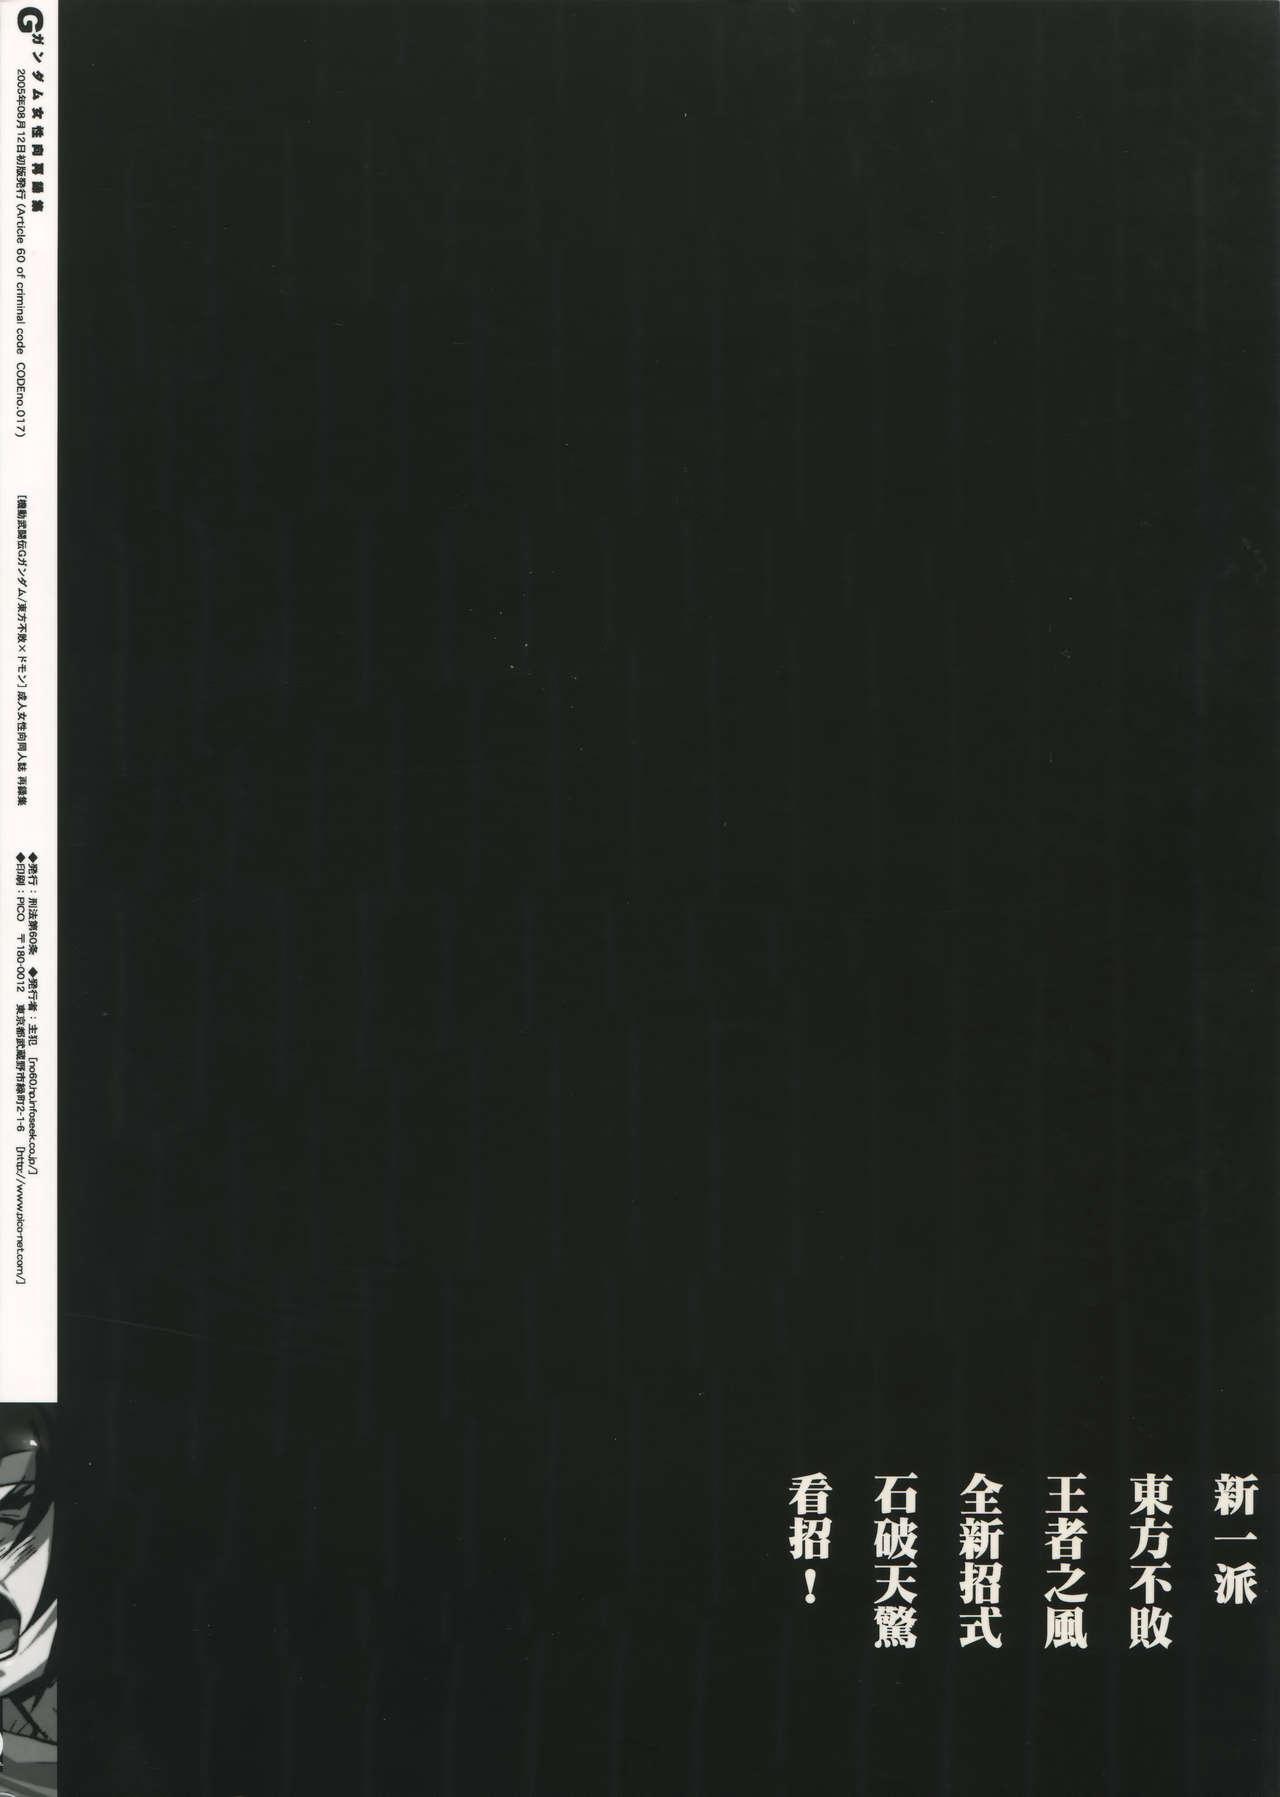 [Article 60 of Criminal Code (Shuhan)] G-gan Josei-Muke Sairoku-Shuu (G Gundam) 74